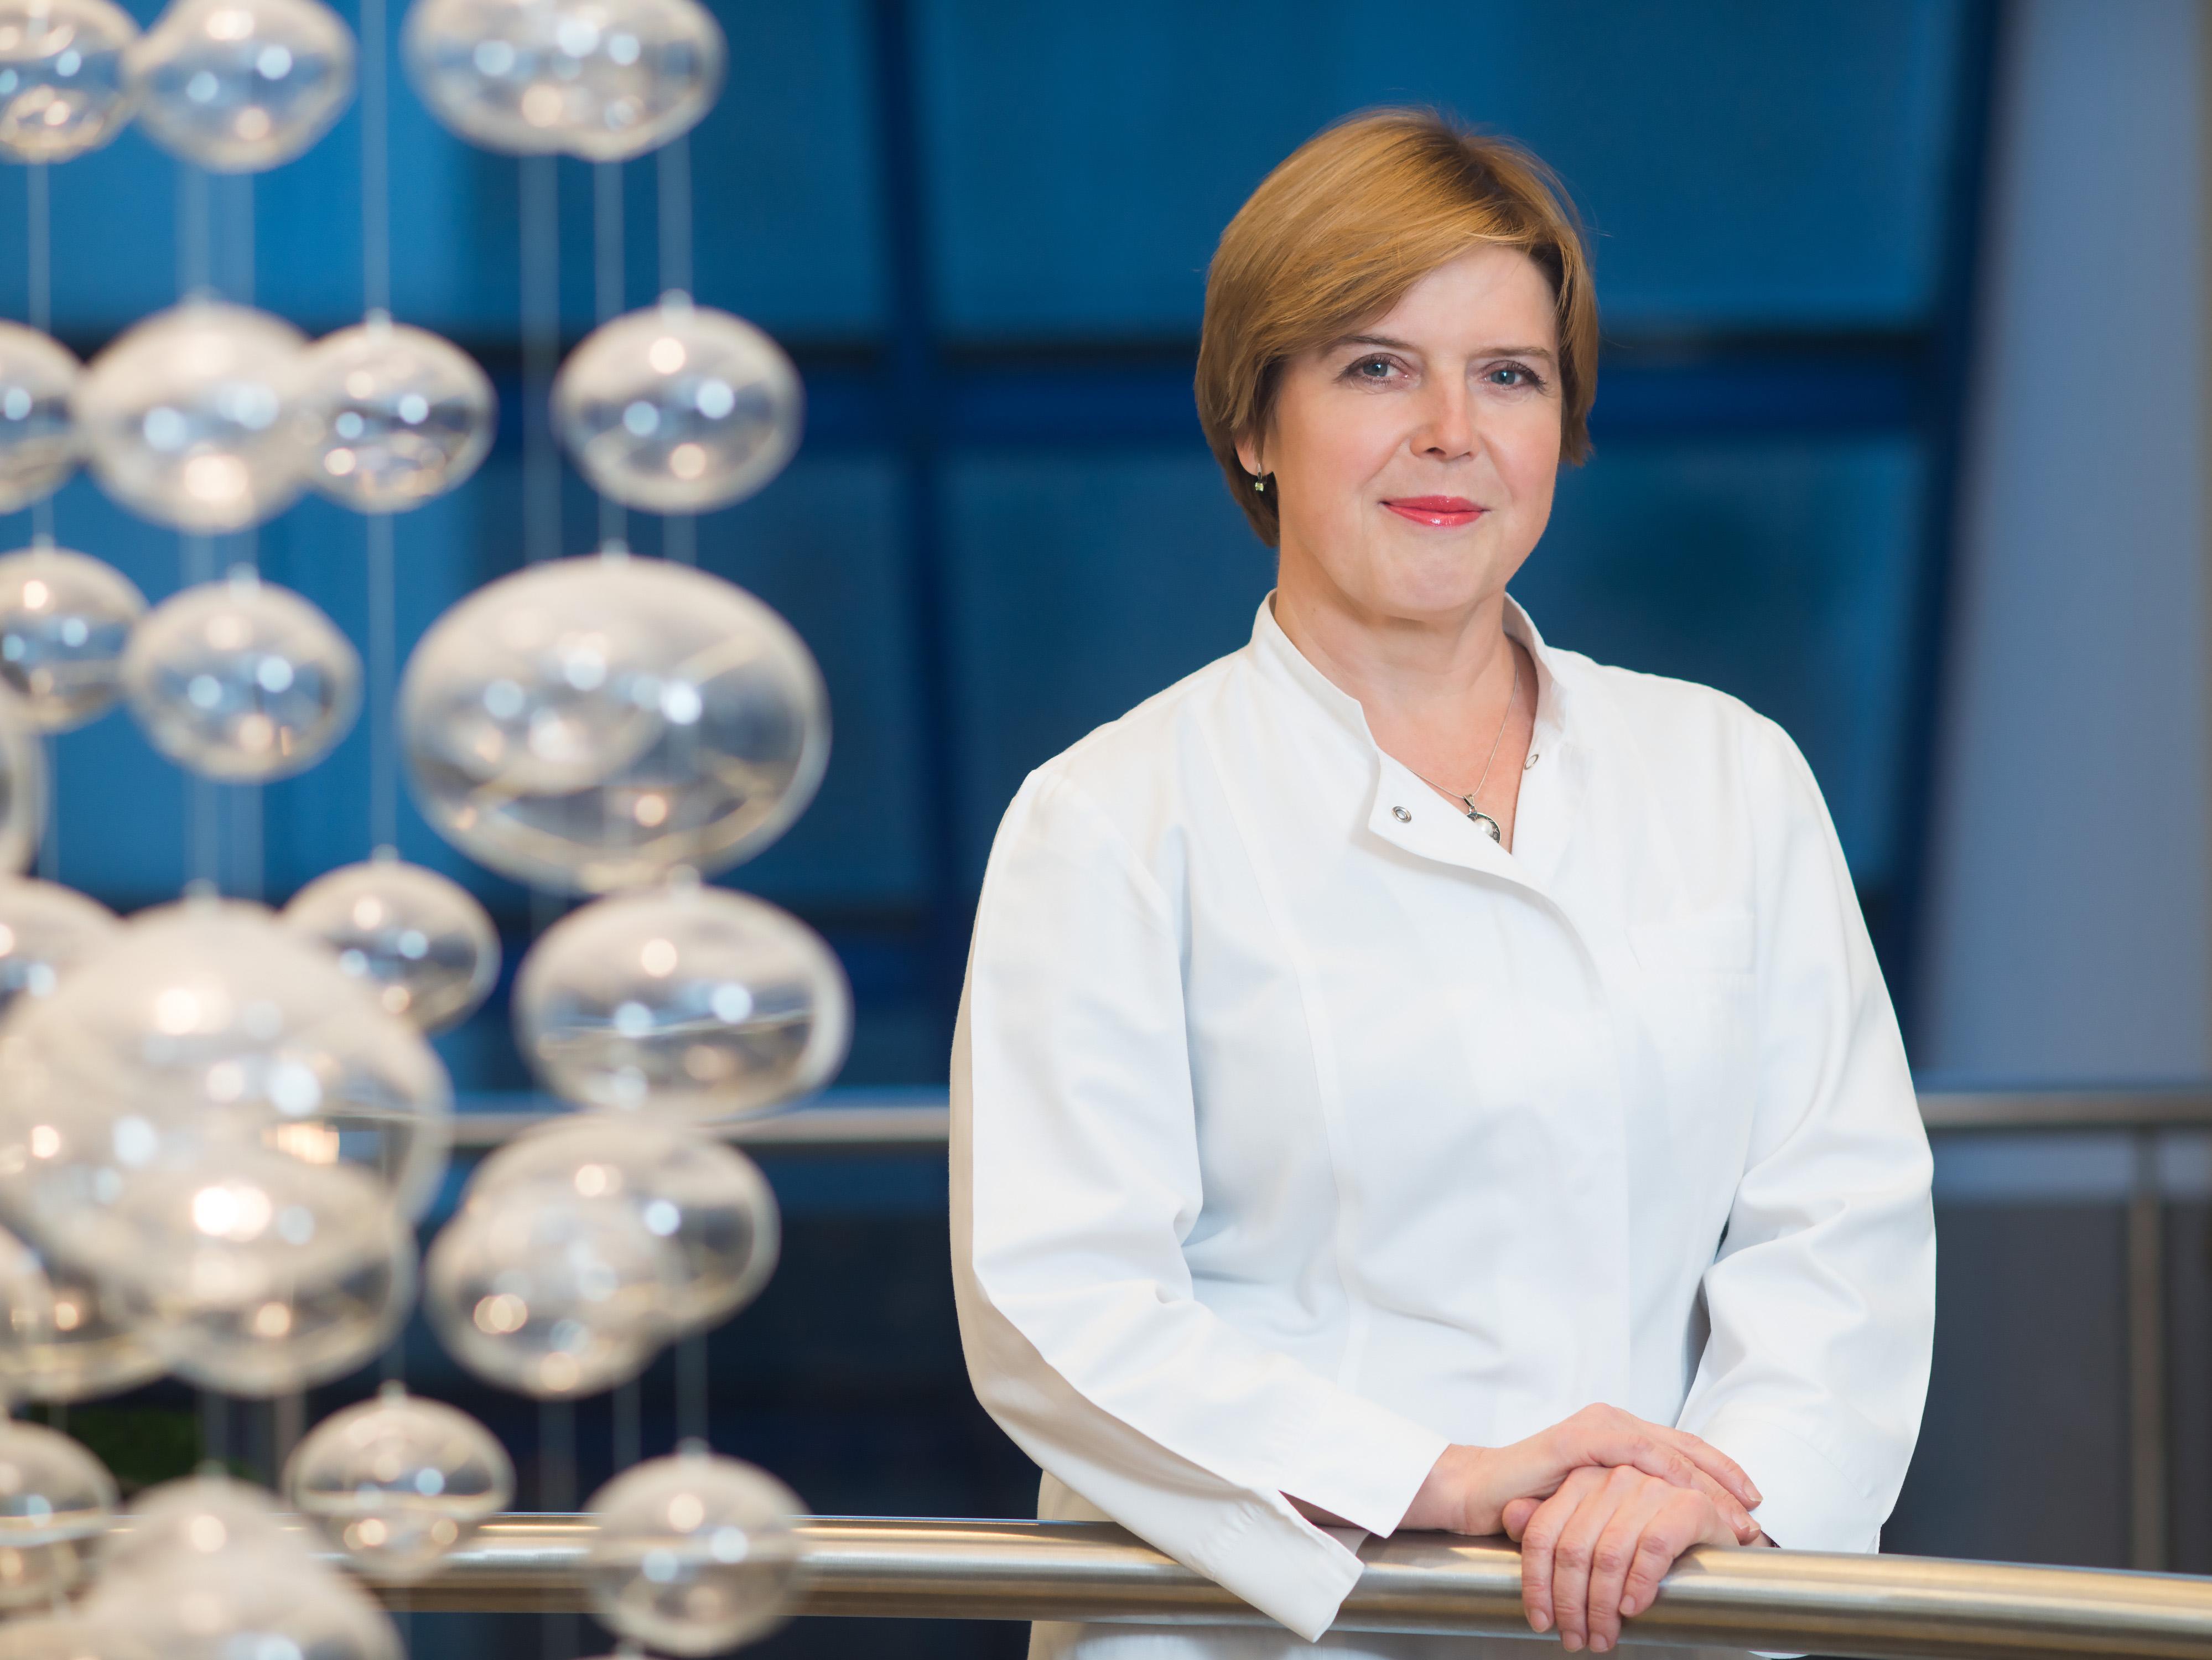 SUGIHARA klinikos dermatologė Jolita Gibavičienė